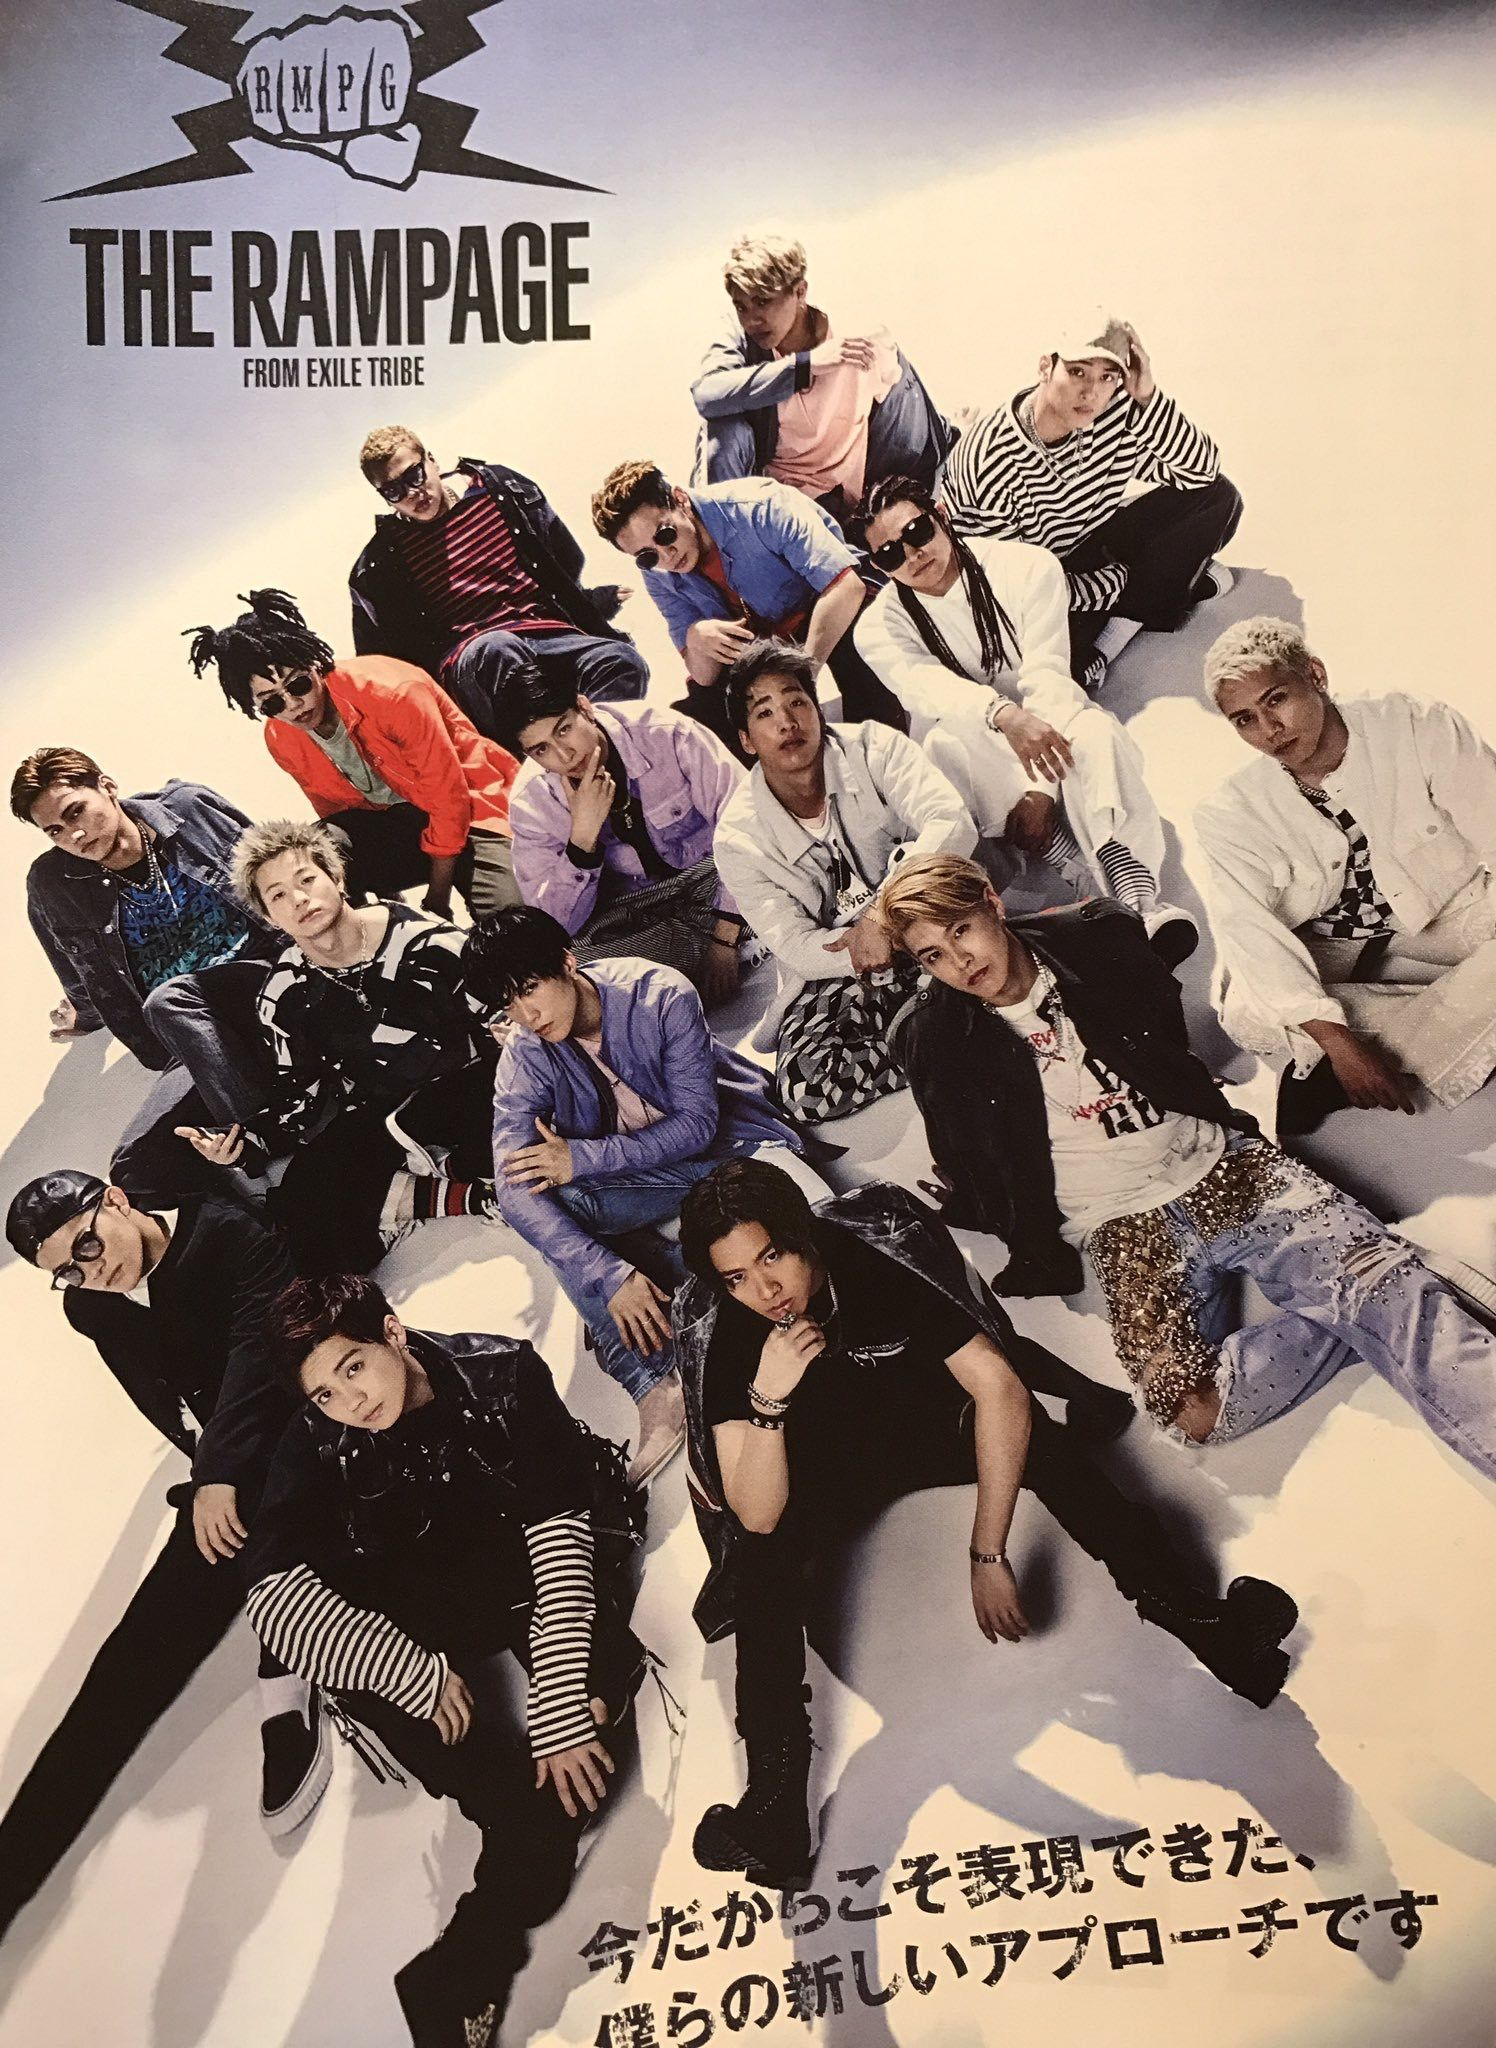 The Rampage From Exile Tribe おしゃれまとめの人気アイデア Pinterest Ben Natnaree 川村壱馬 吉野北人 長谷川慎